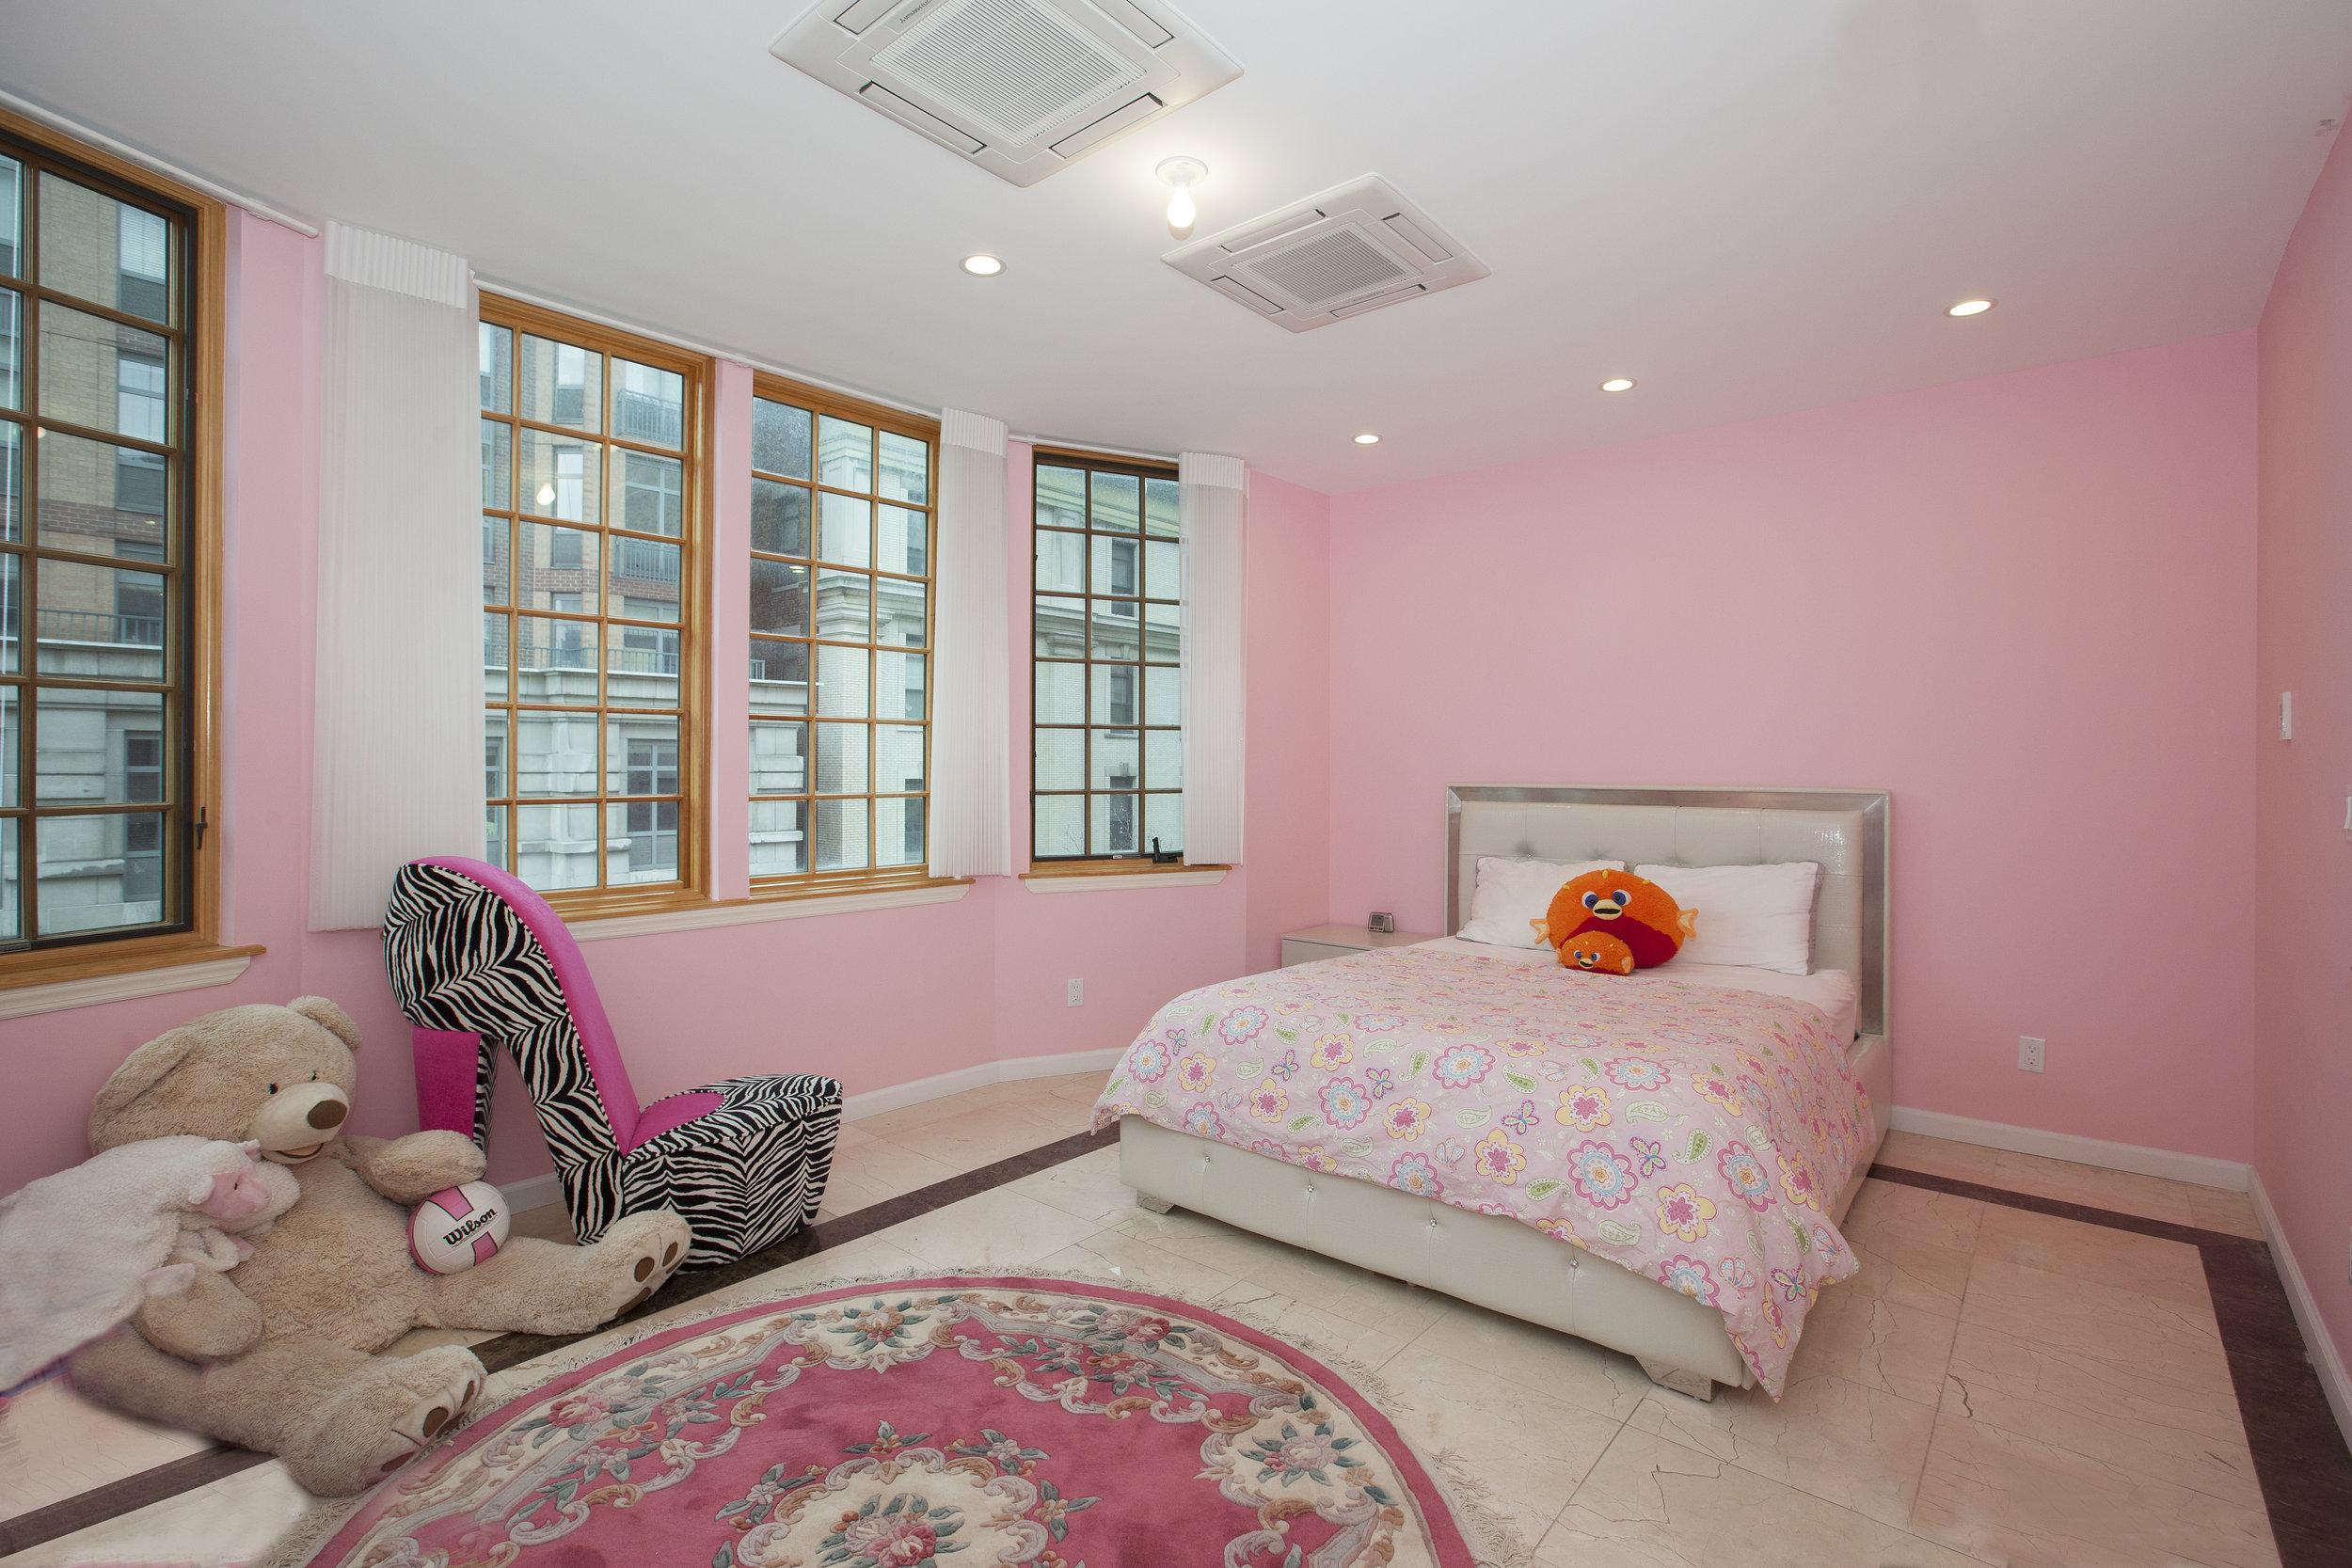 East_76th_Street_195_TH_Second_Bedroom_.jpg